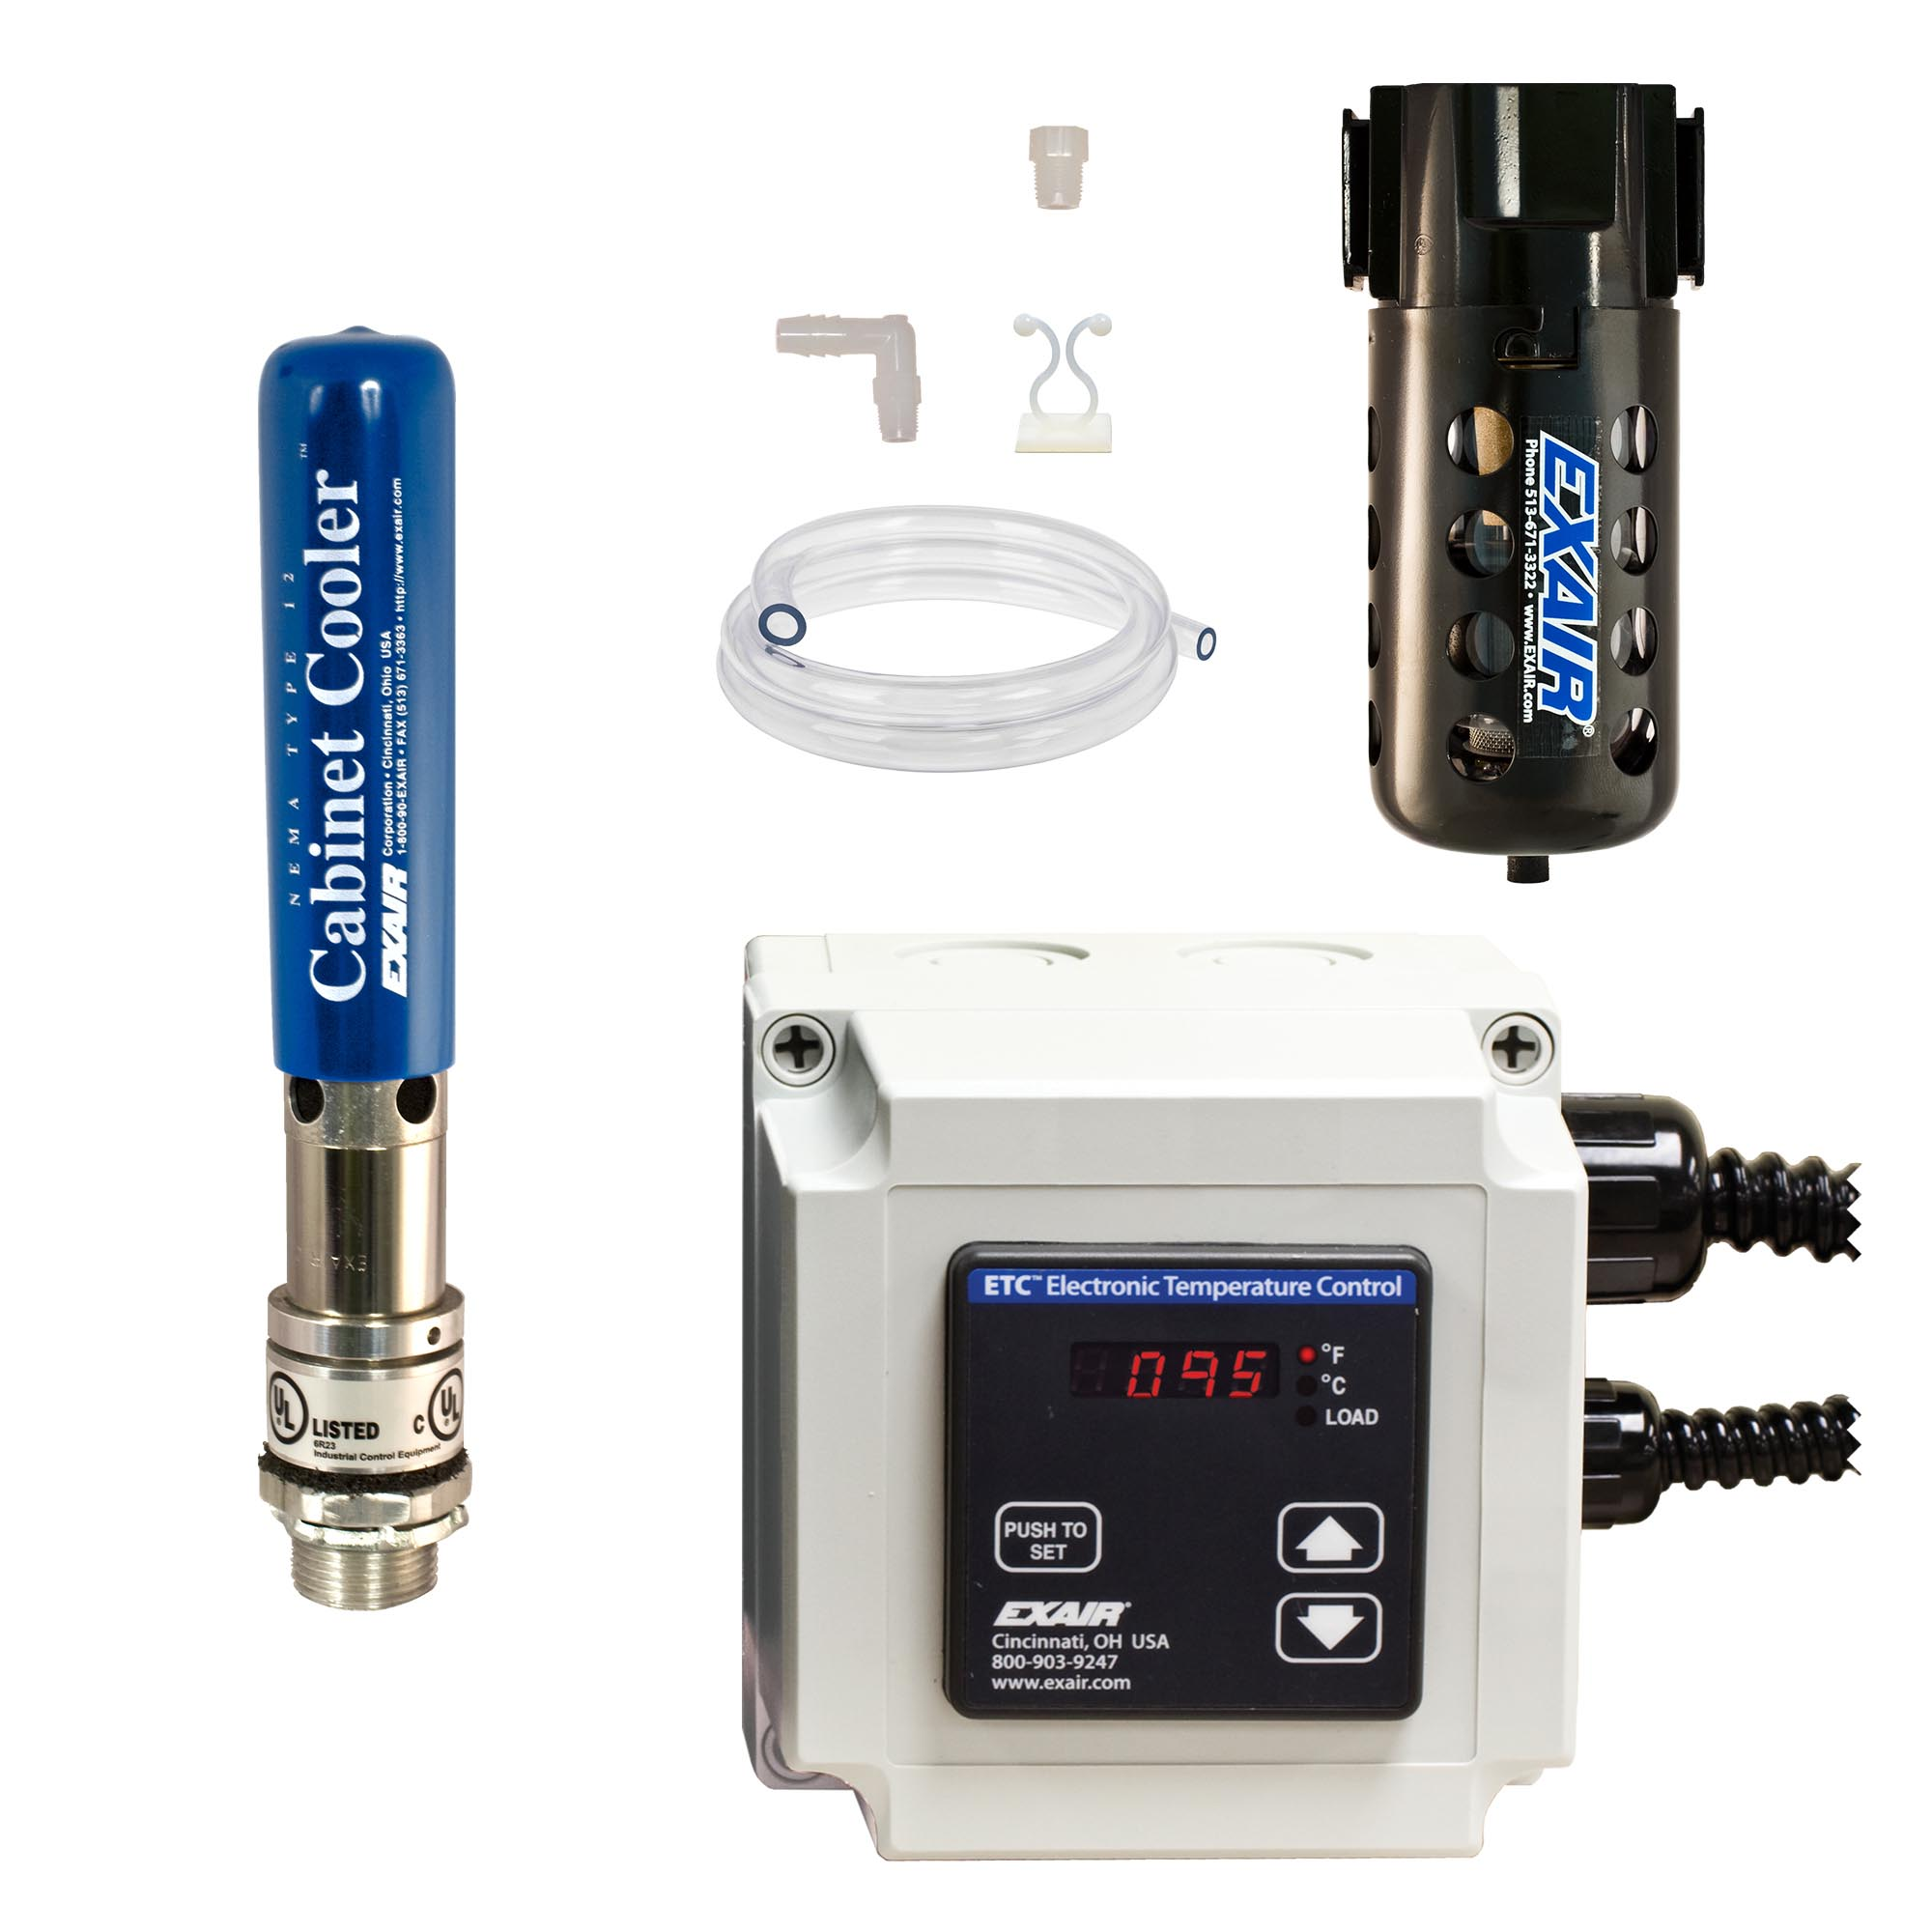 Model W4340-ETC120 NEMA 12 2,800 Btu/hr Cabinet Cooler System with ETC Thermostat Control, 120V